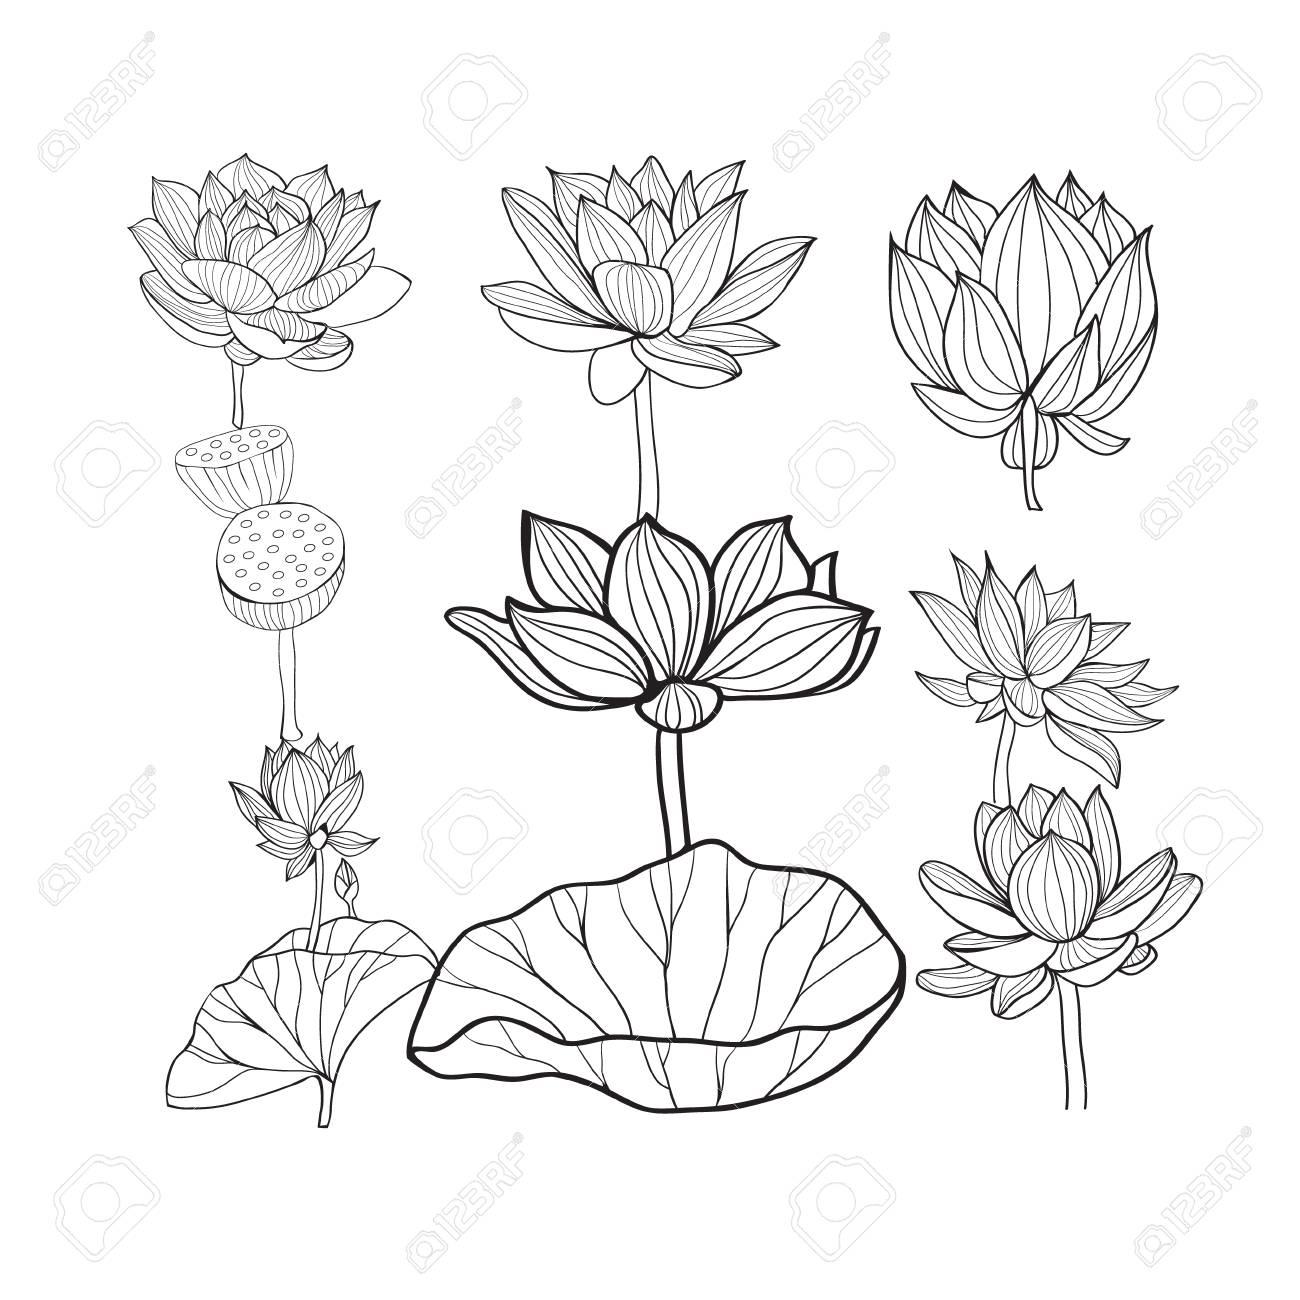 Set of beautiful monochrome hand drawn lotus flowers and leaves set of beautiful monochrome hand drawn lotus flowers and leaves sketch floral collection in black izmirmasajfo